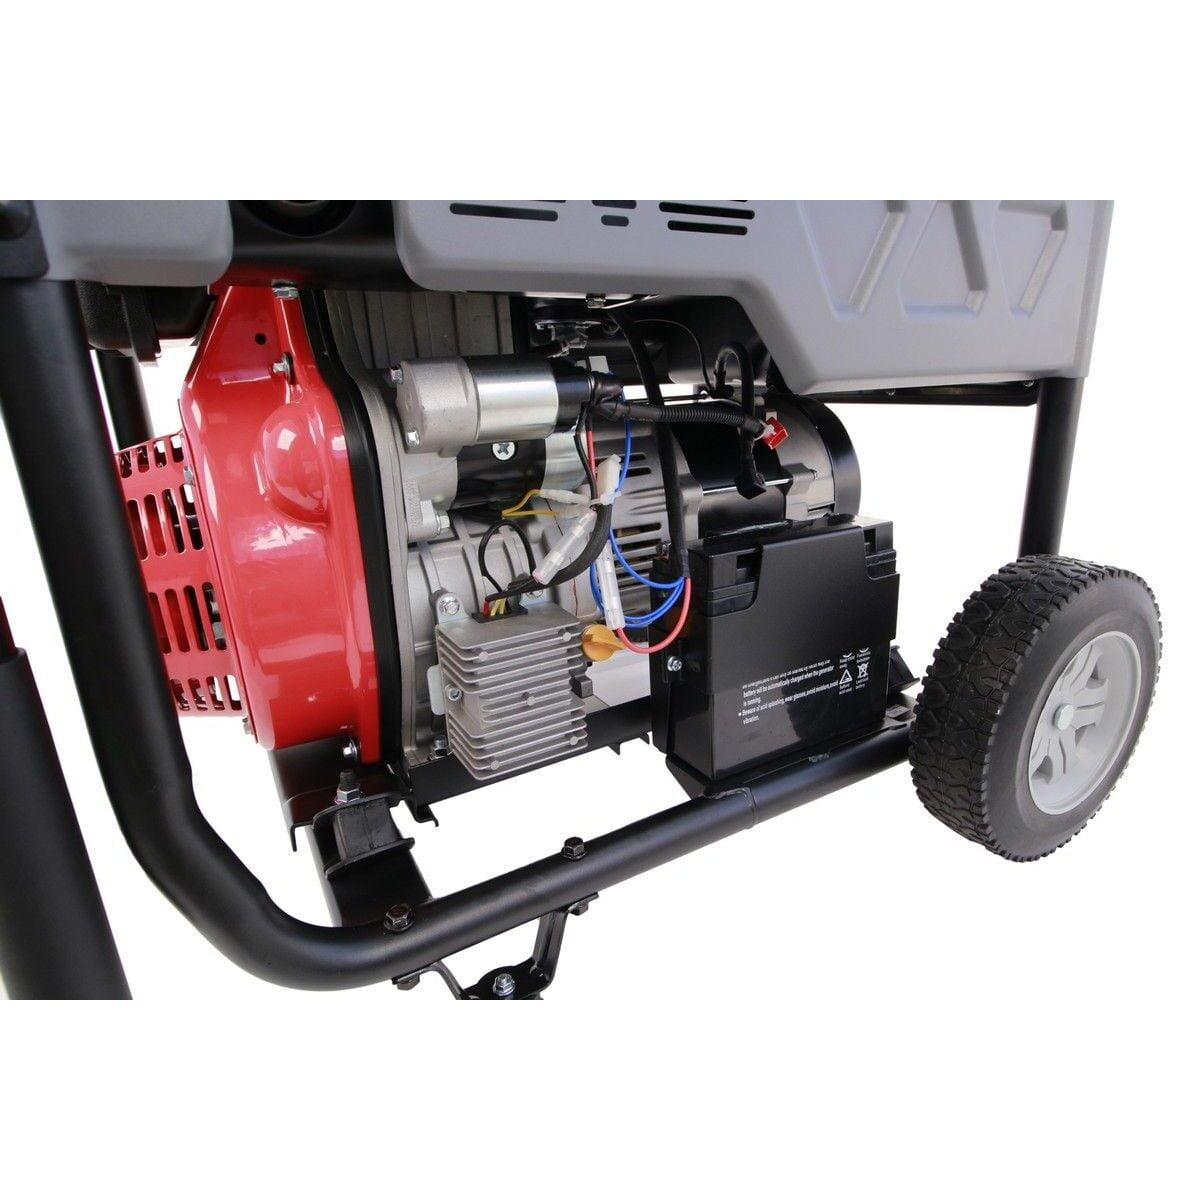 lcd7500d generator loncin 6 0kw 220v diesel o mac.ro 10